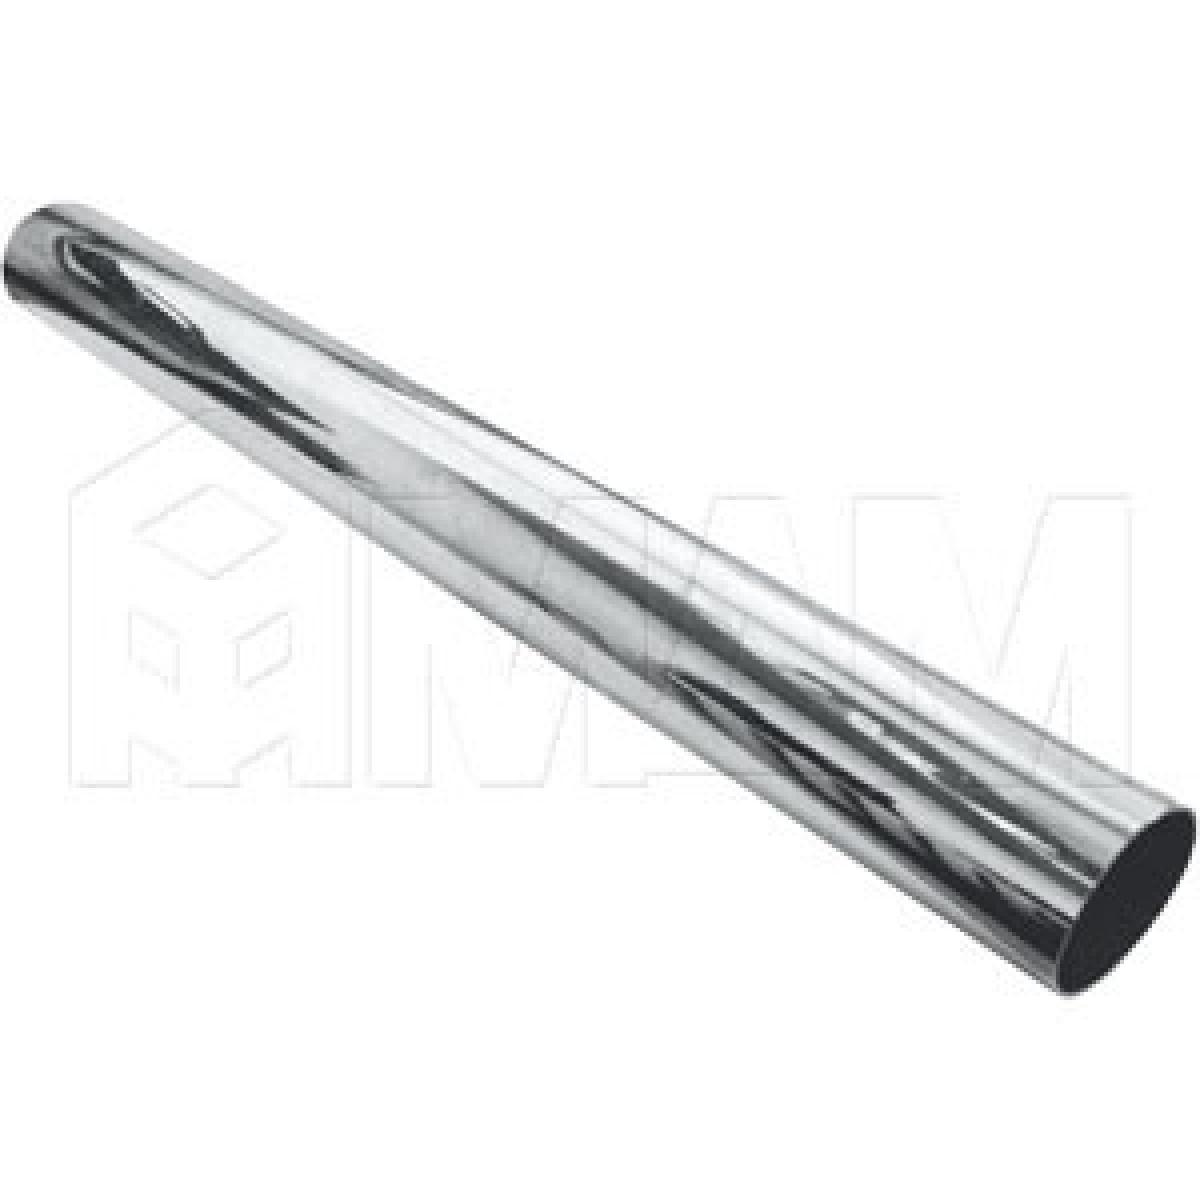 Барные стойки D50 мм - Труба L=3000 мм D=50мм (хром)